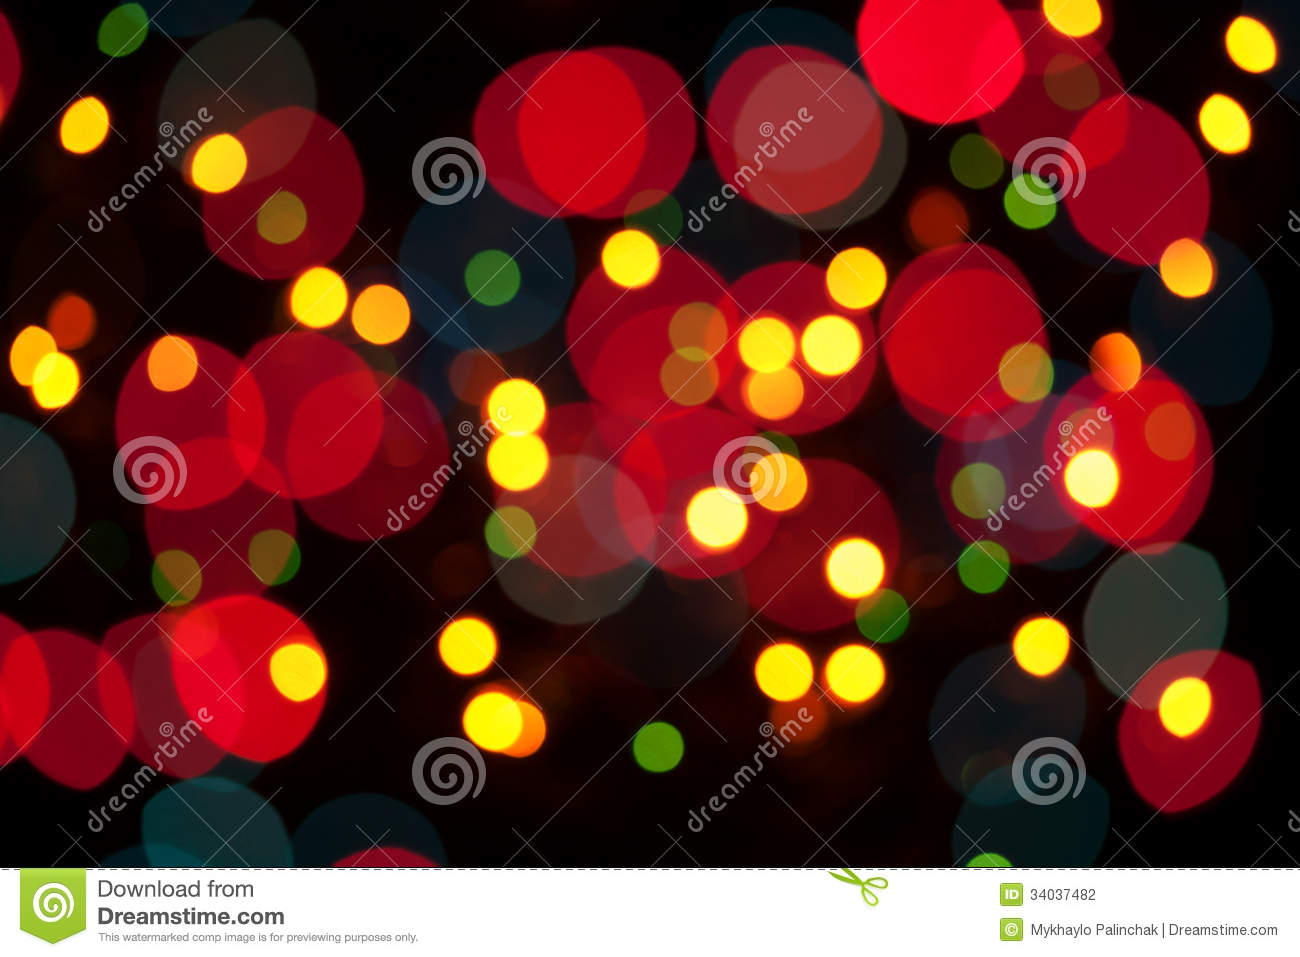 Blinking Christmas Lights Wallpaper View Original [Updated on 085 1300x957